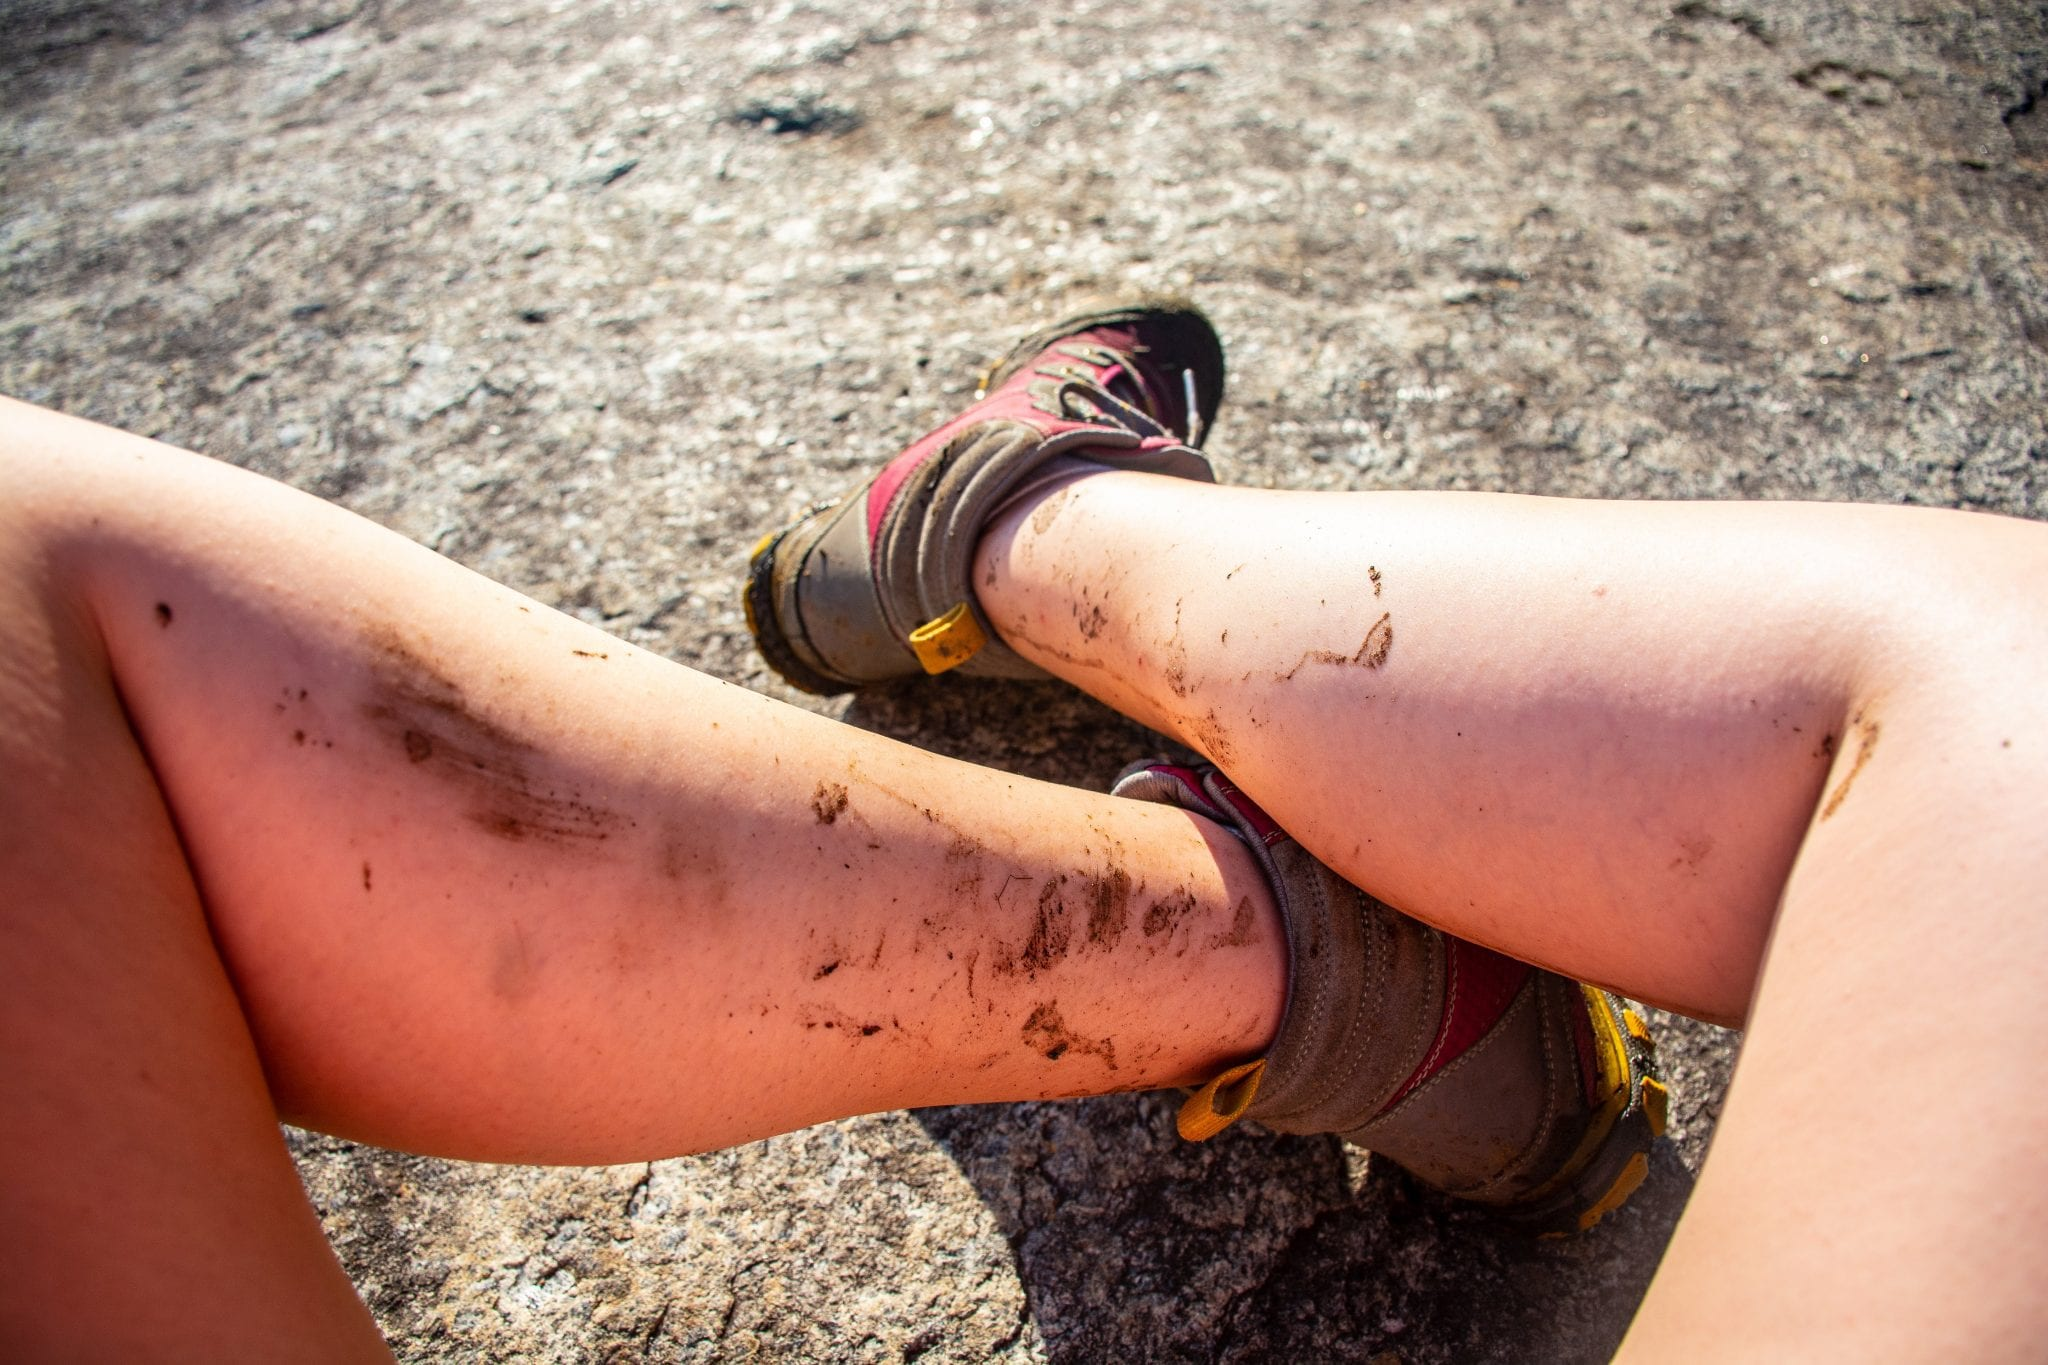 Legs splattered with mud